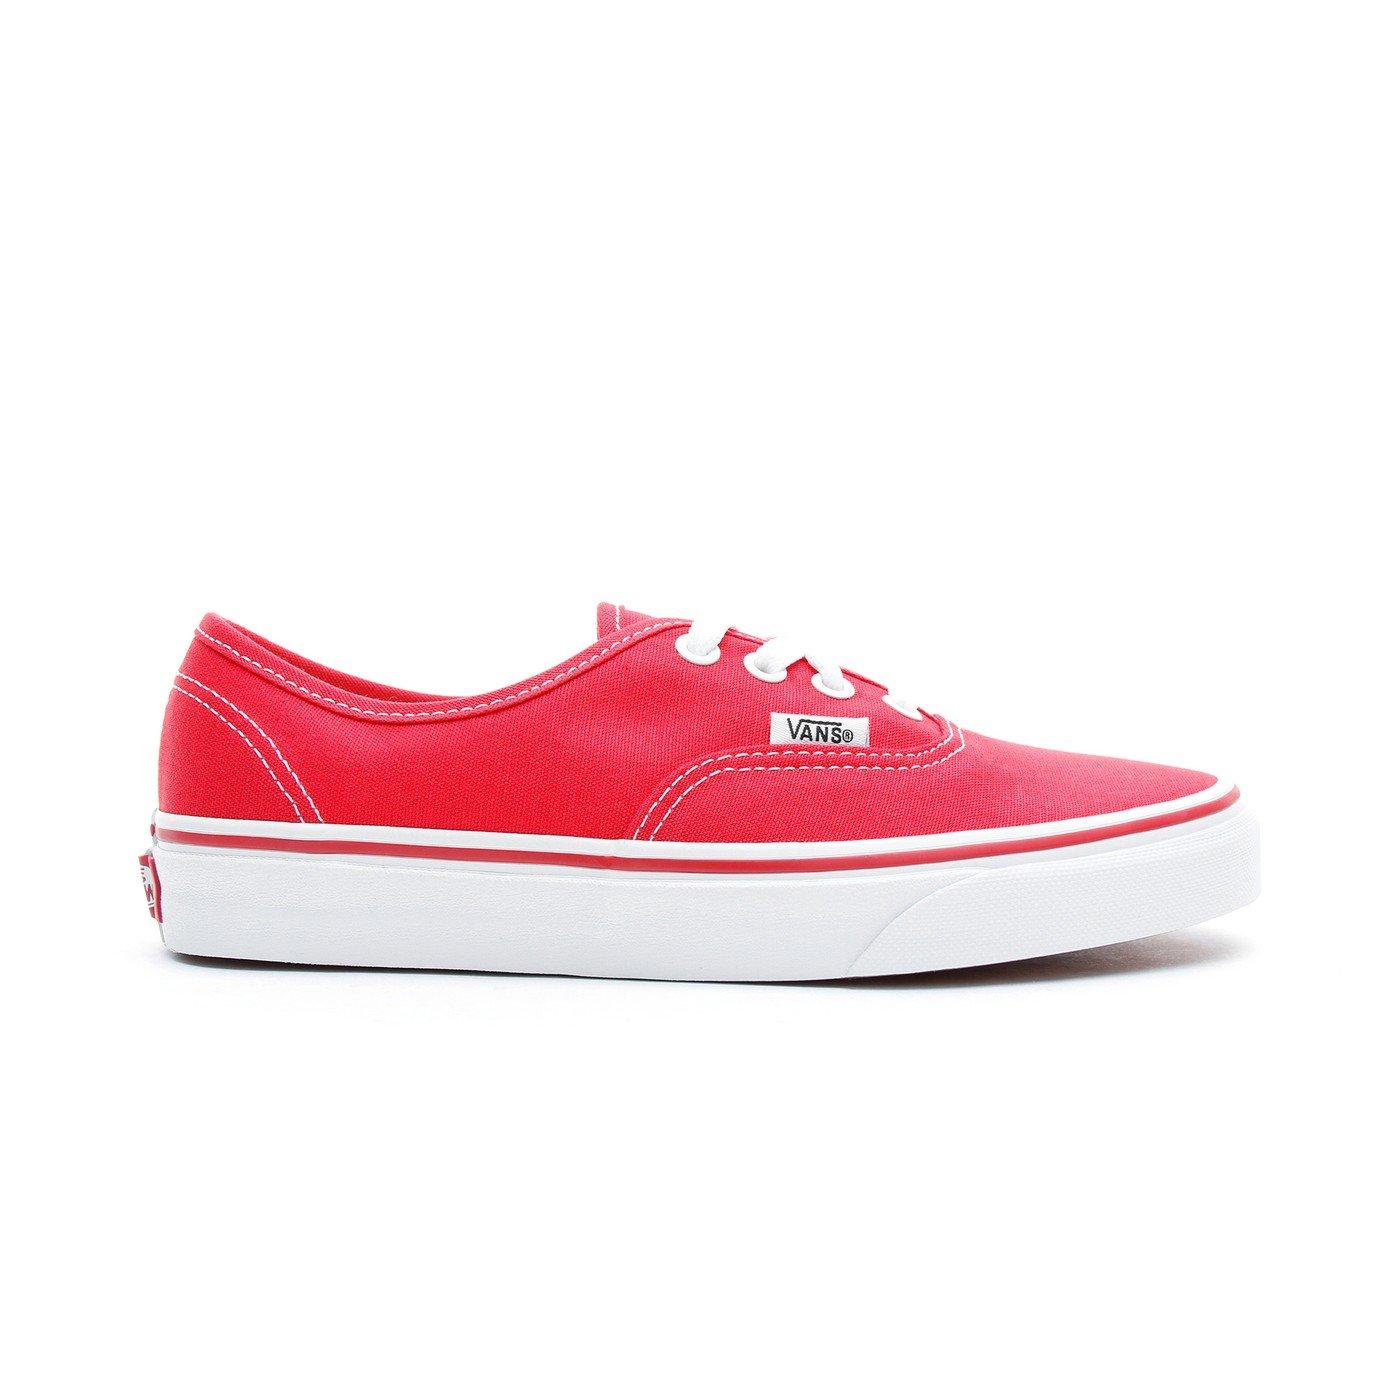 Vans Authentic Kırmızı Unisex Sneaker